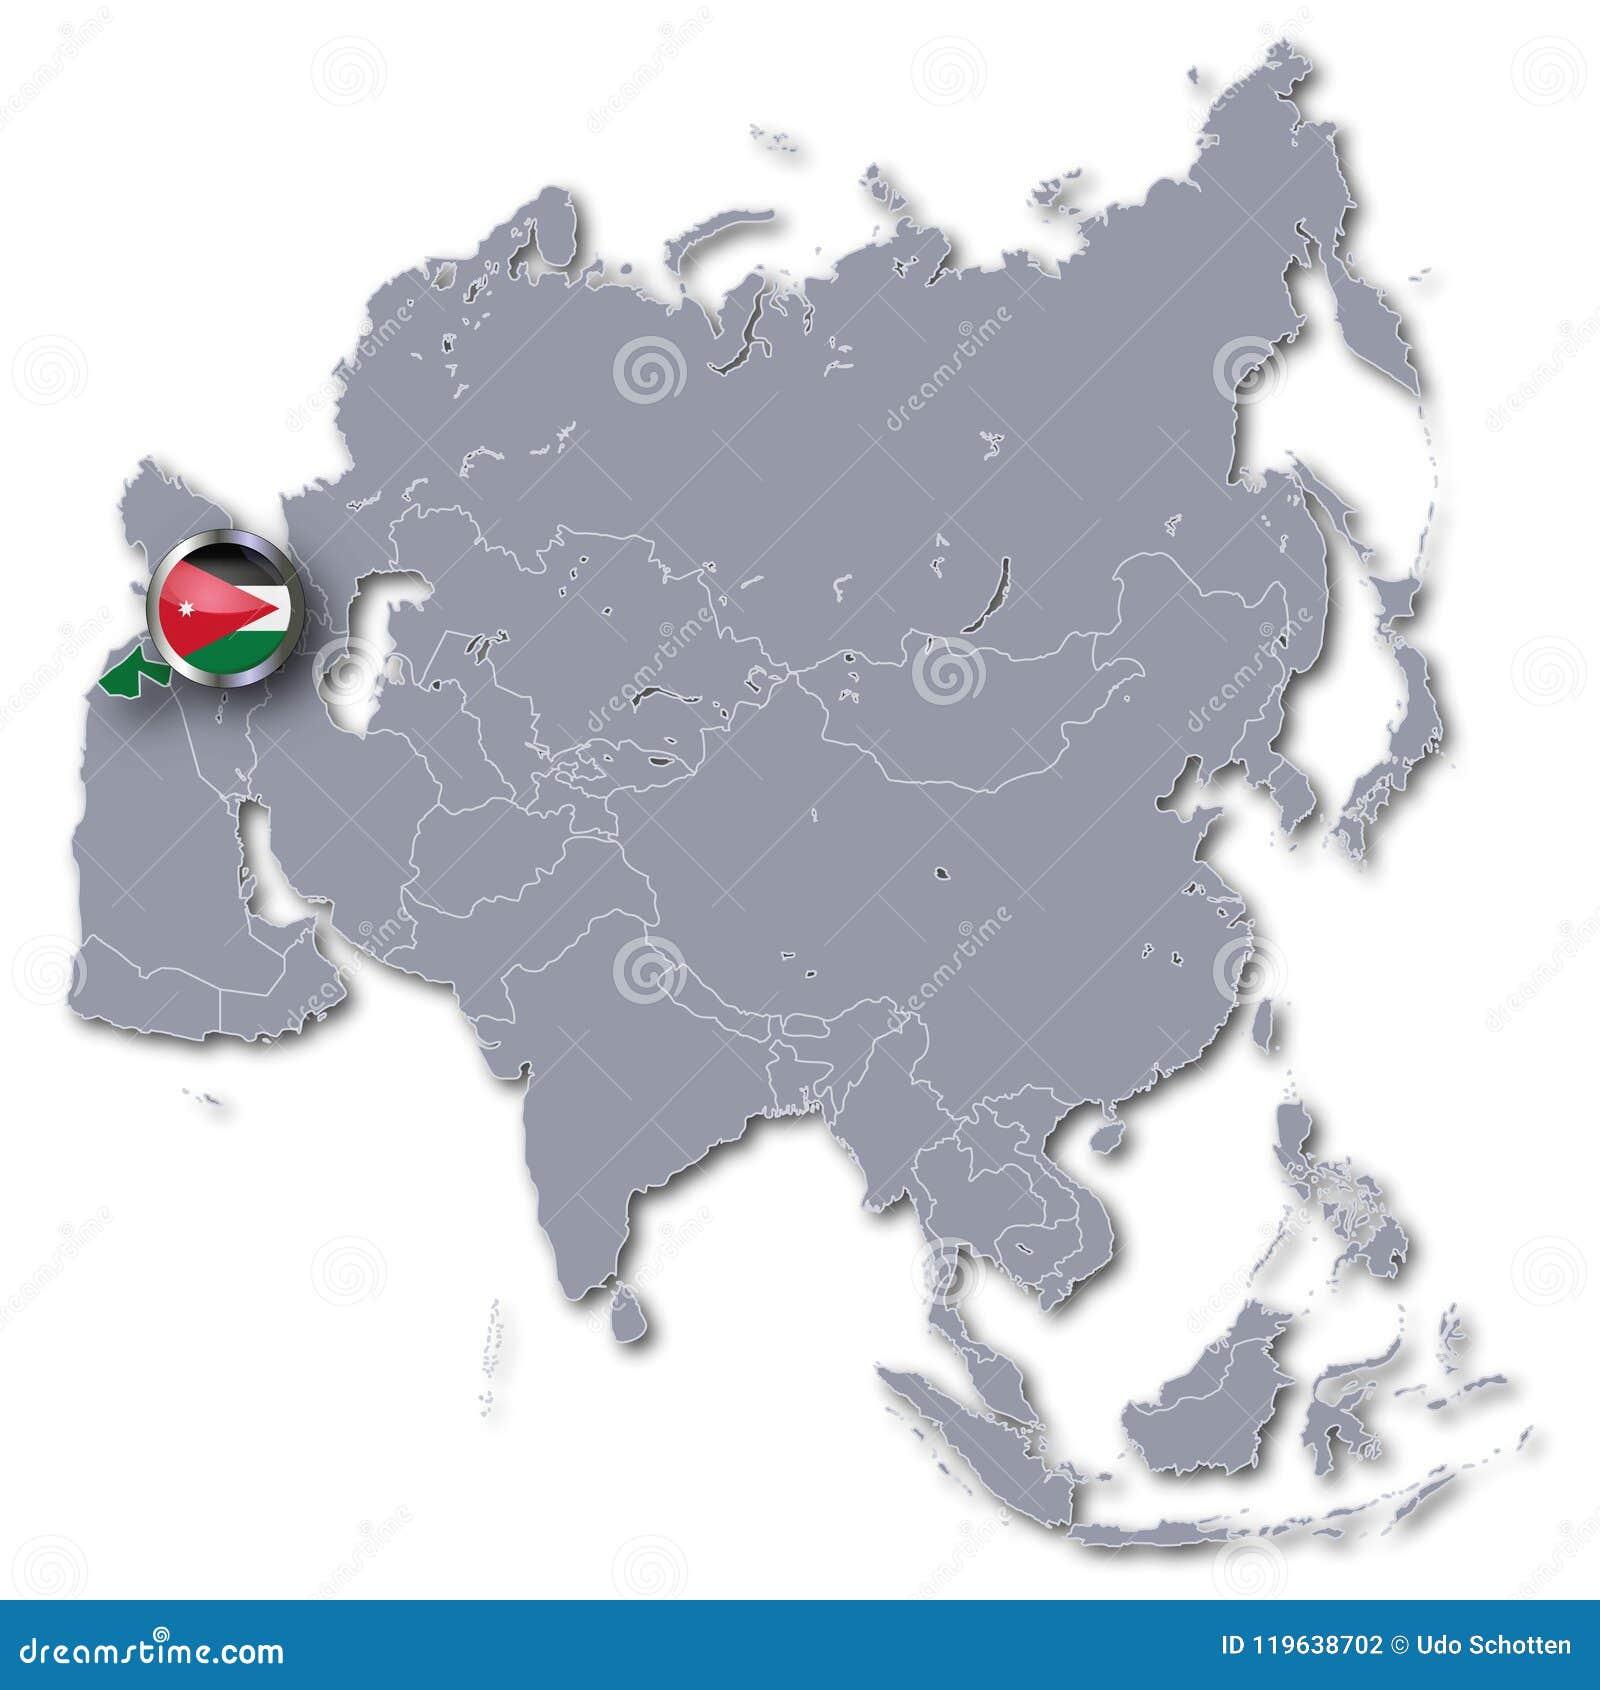 Map Of Asia Jordan.Asia Map With Jordan Stock Illustration Illustration Of Logistics